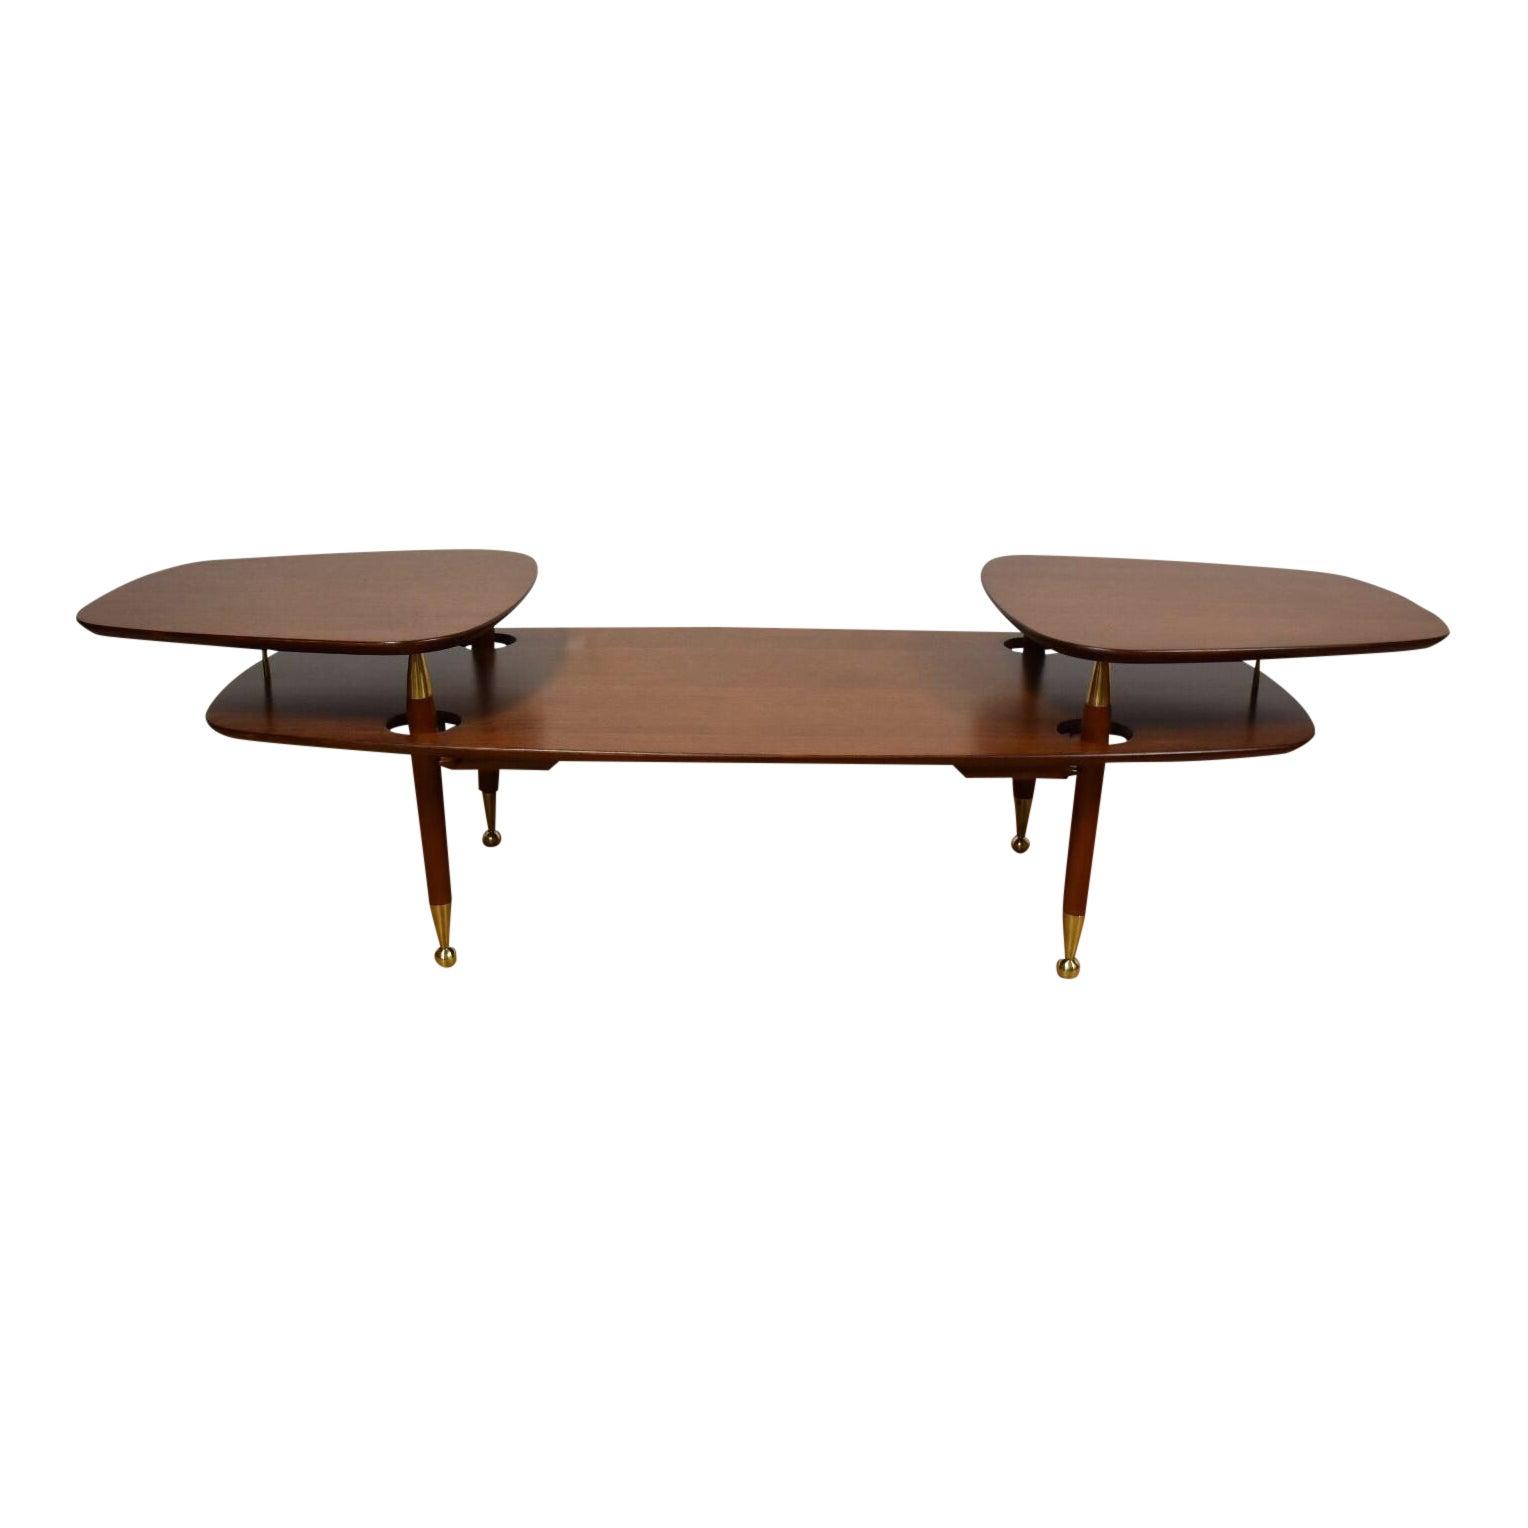 2 Tiered Mahogany Brass Coffee Table Chairish